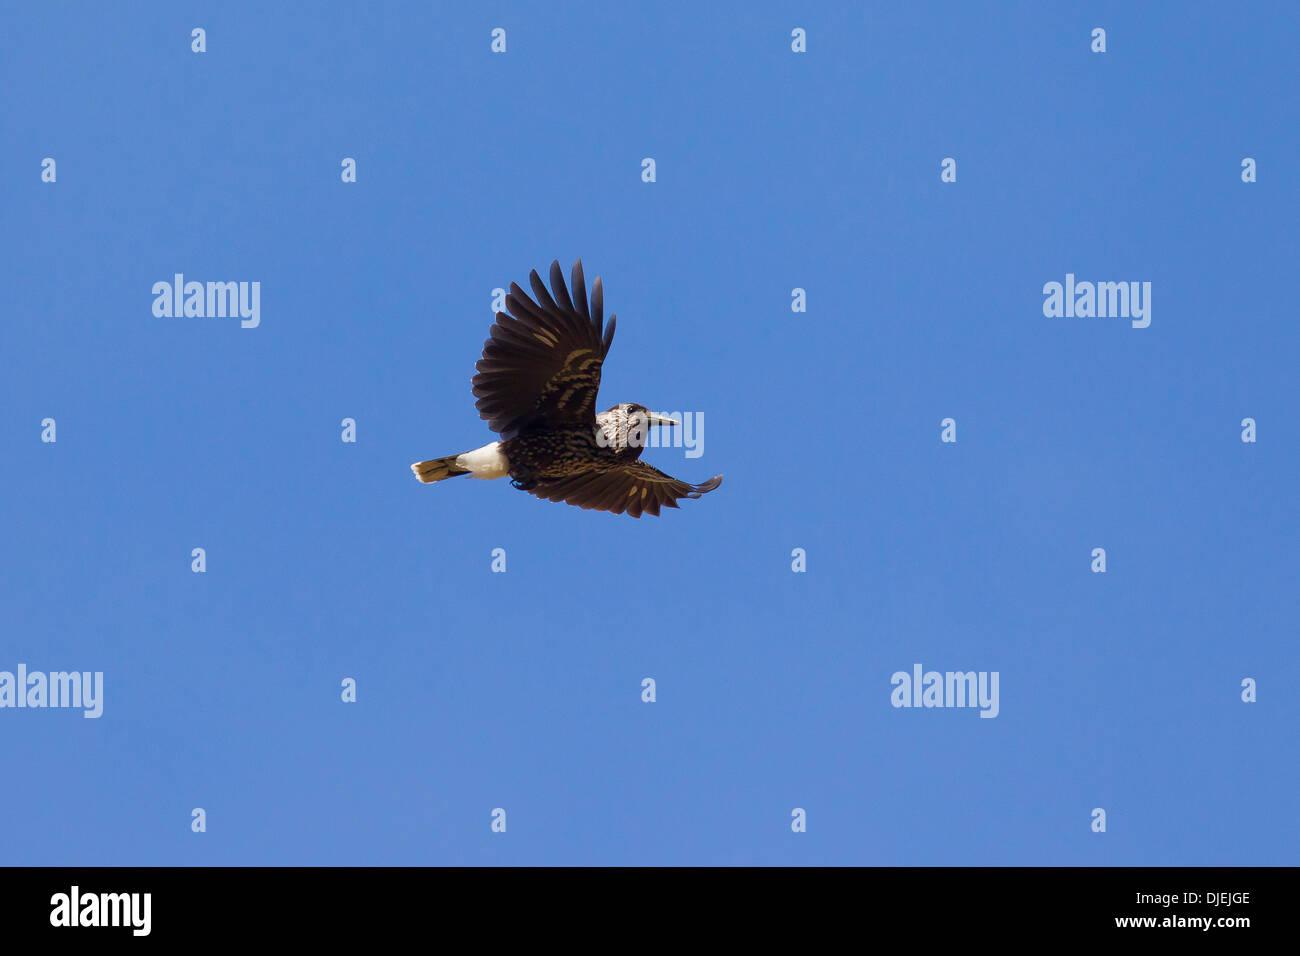 Spotted nutcracker / Eurasian nutcracker (Nucifraga caryocatactes) in flight in the Alps - Stock Image